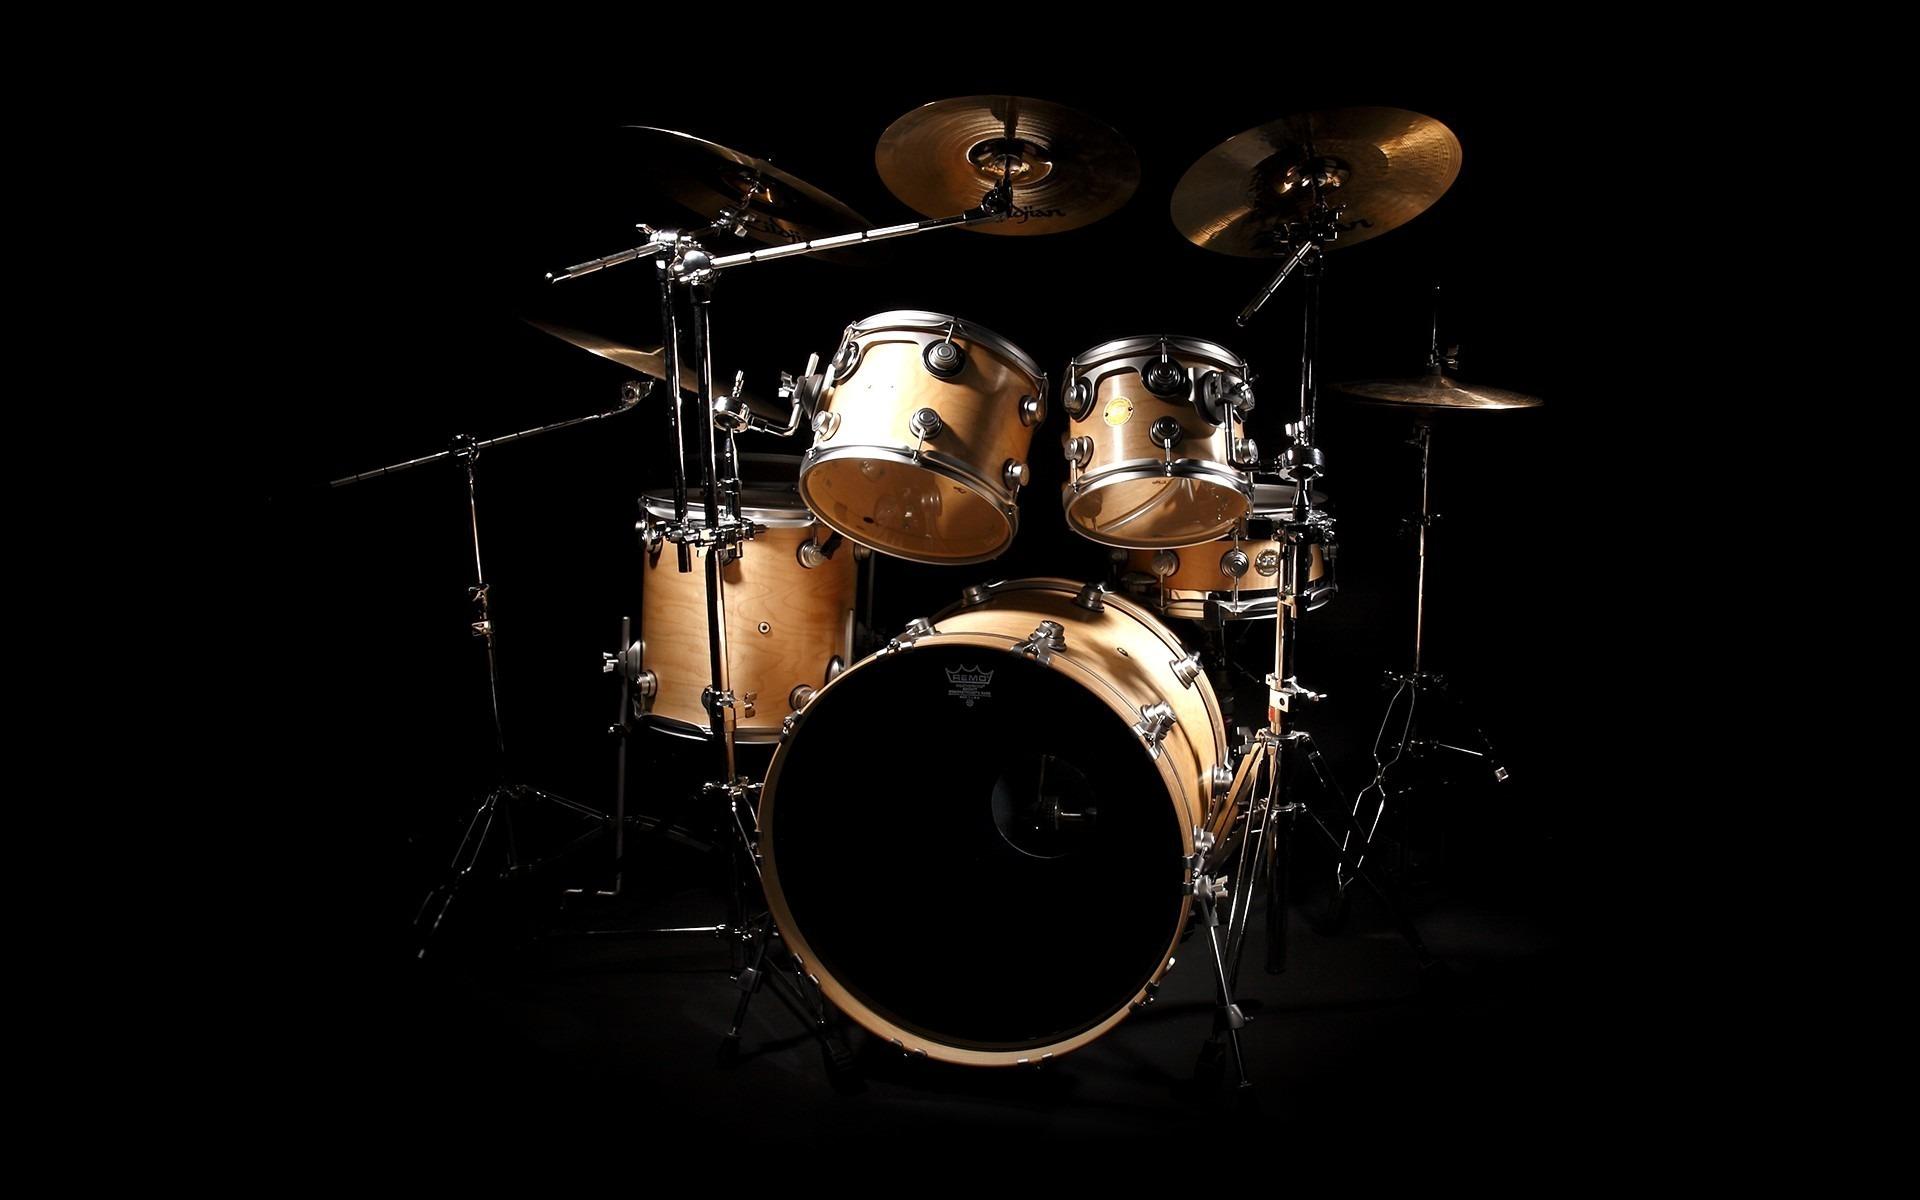 Drums Full Hd Wallpaper And Hintergrund 1920x1200 Id